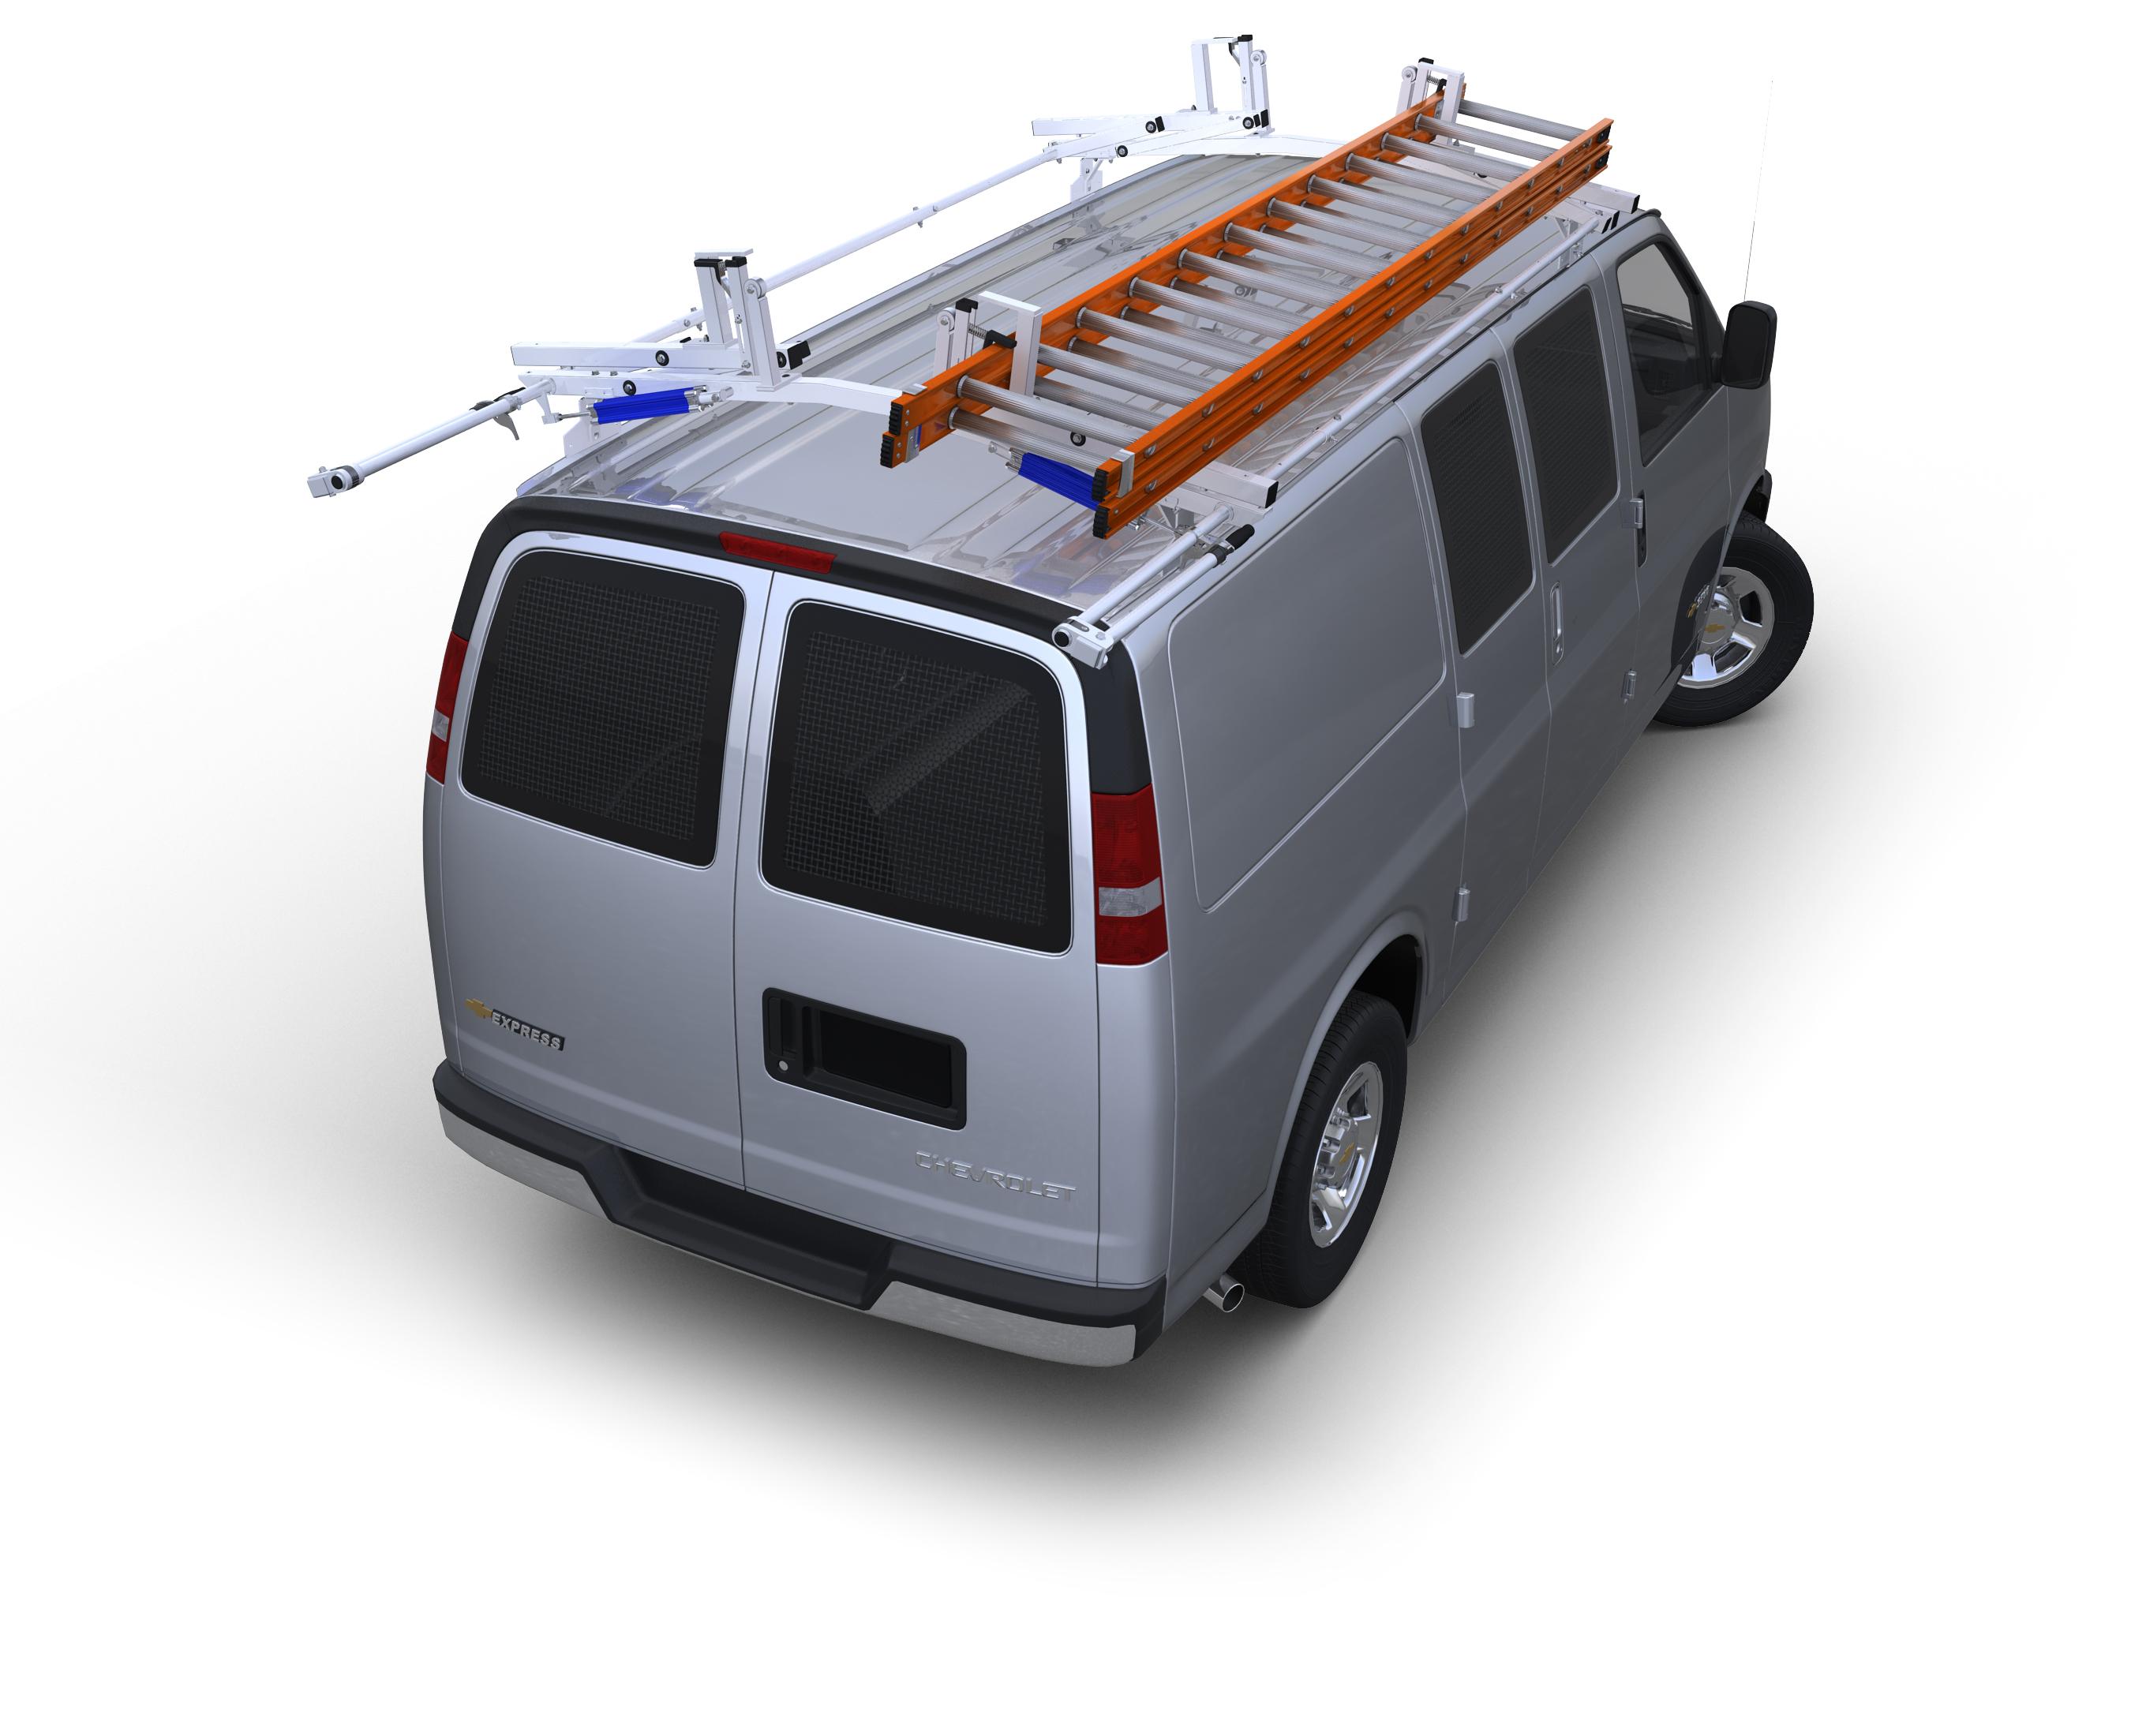 Slick Locks Hasp Locking System Cargo Van Security Door